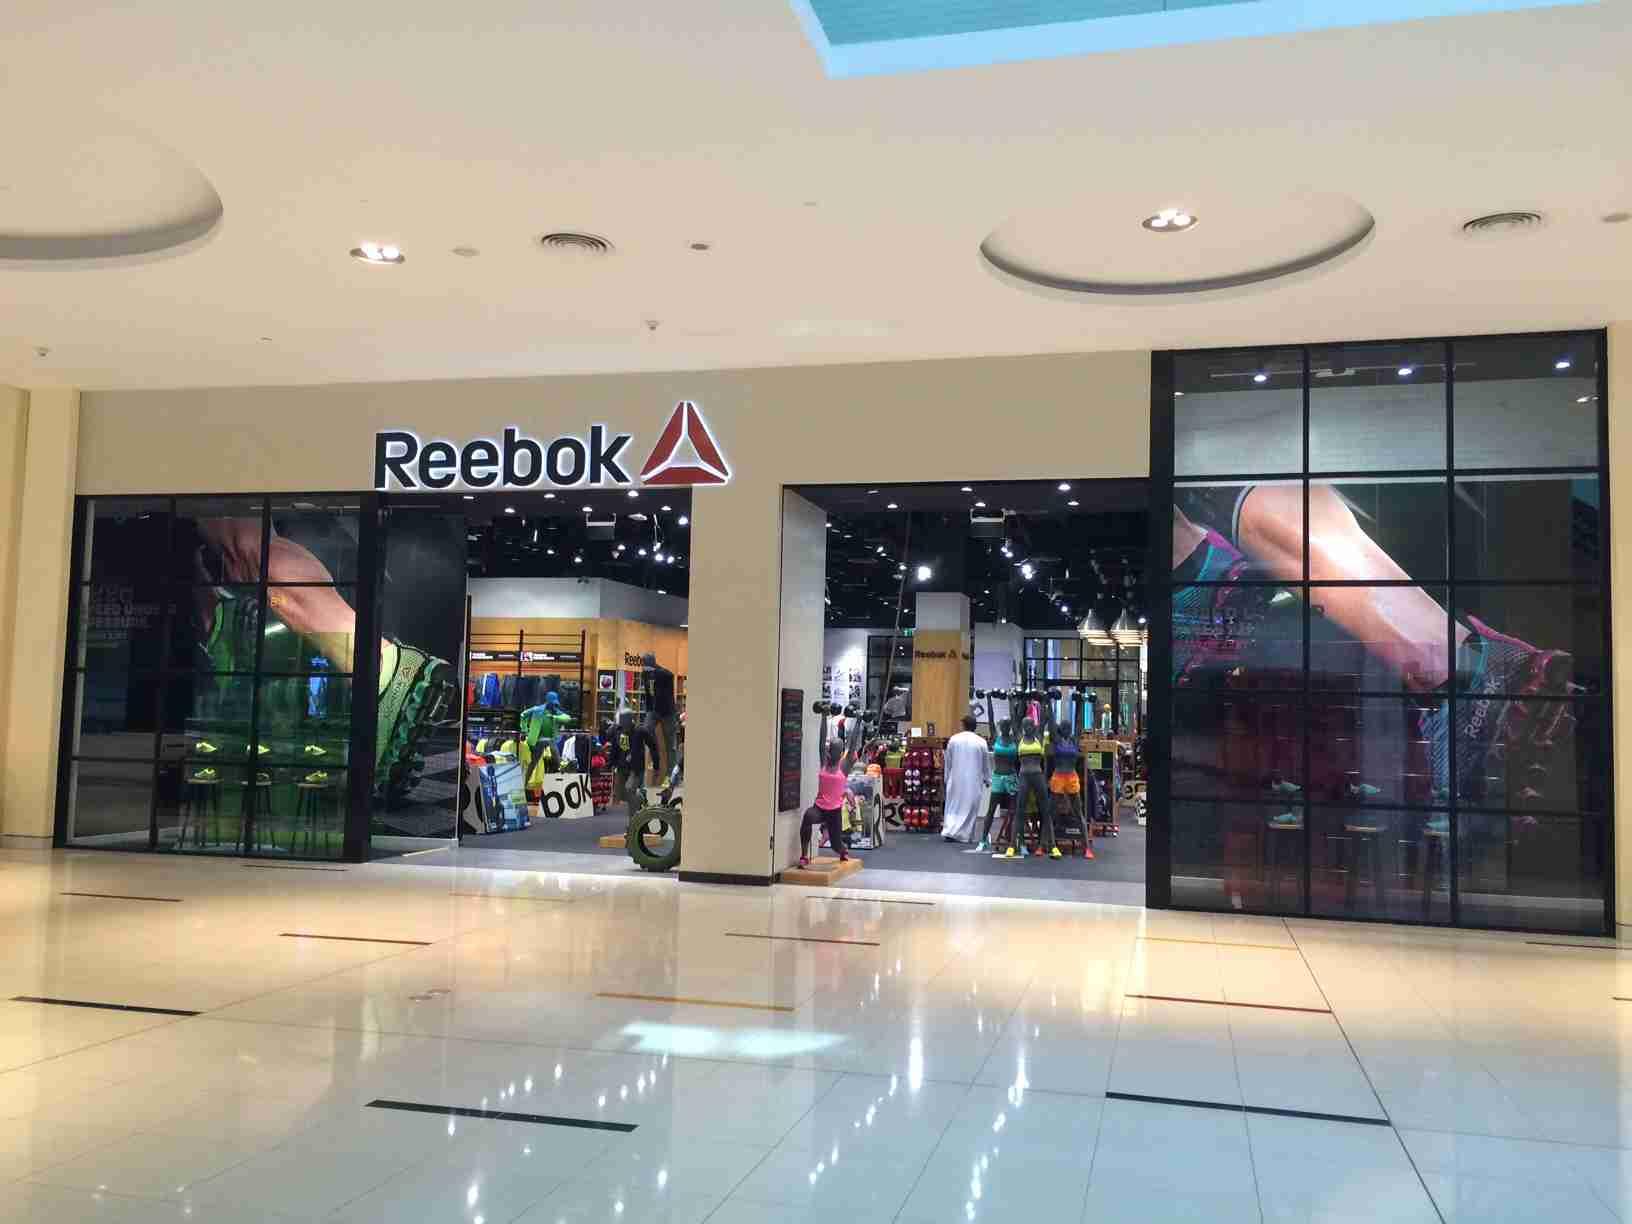 Buy \u003e reebok mall - OFF 74% \u003e Free delivery